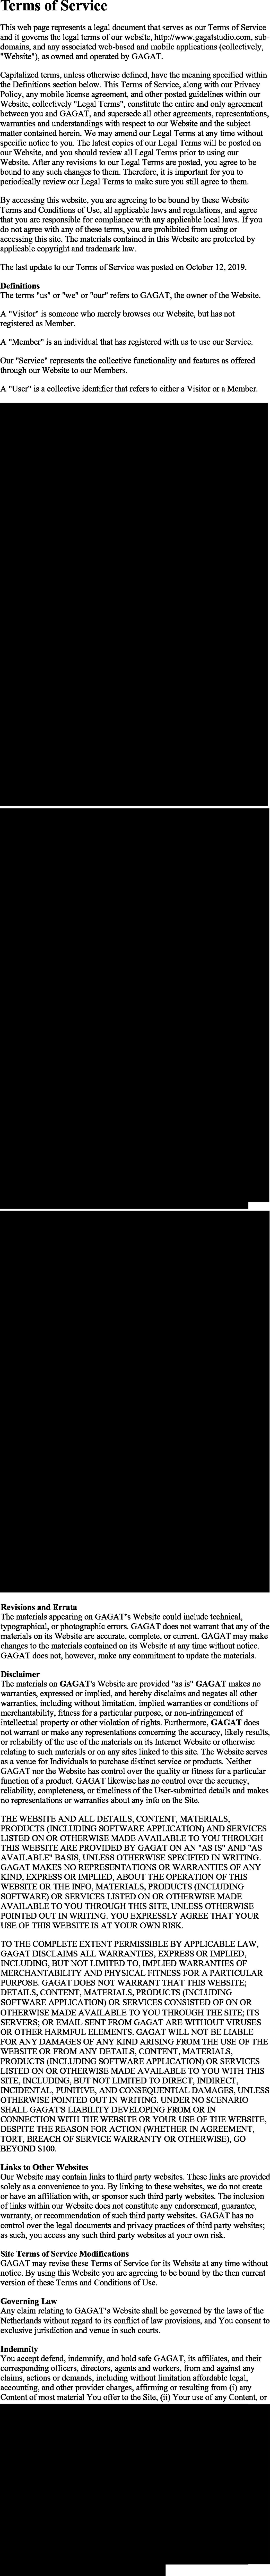 Terms of Service_transparent.png